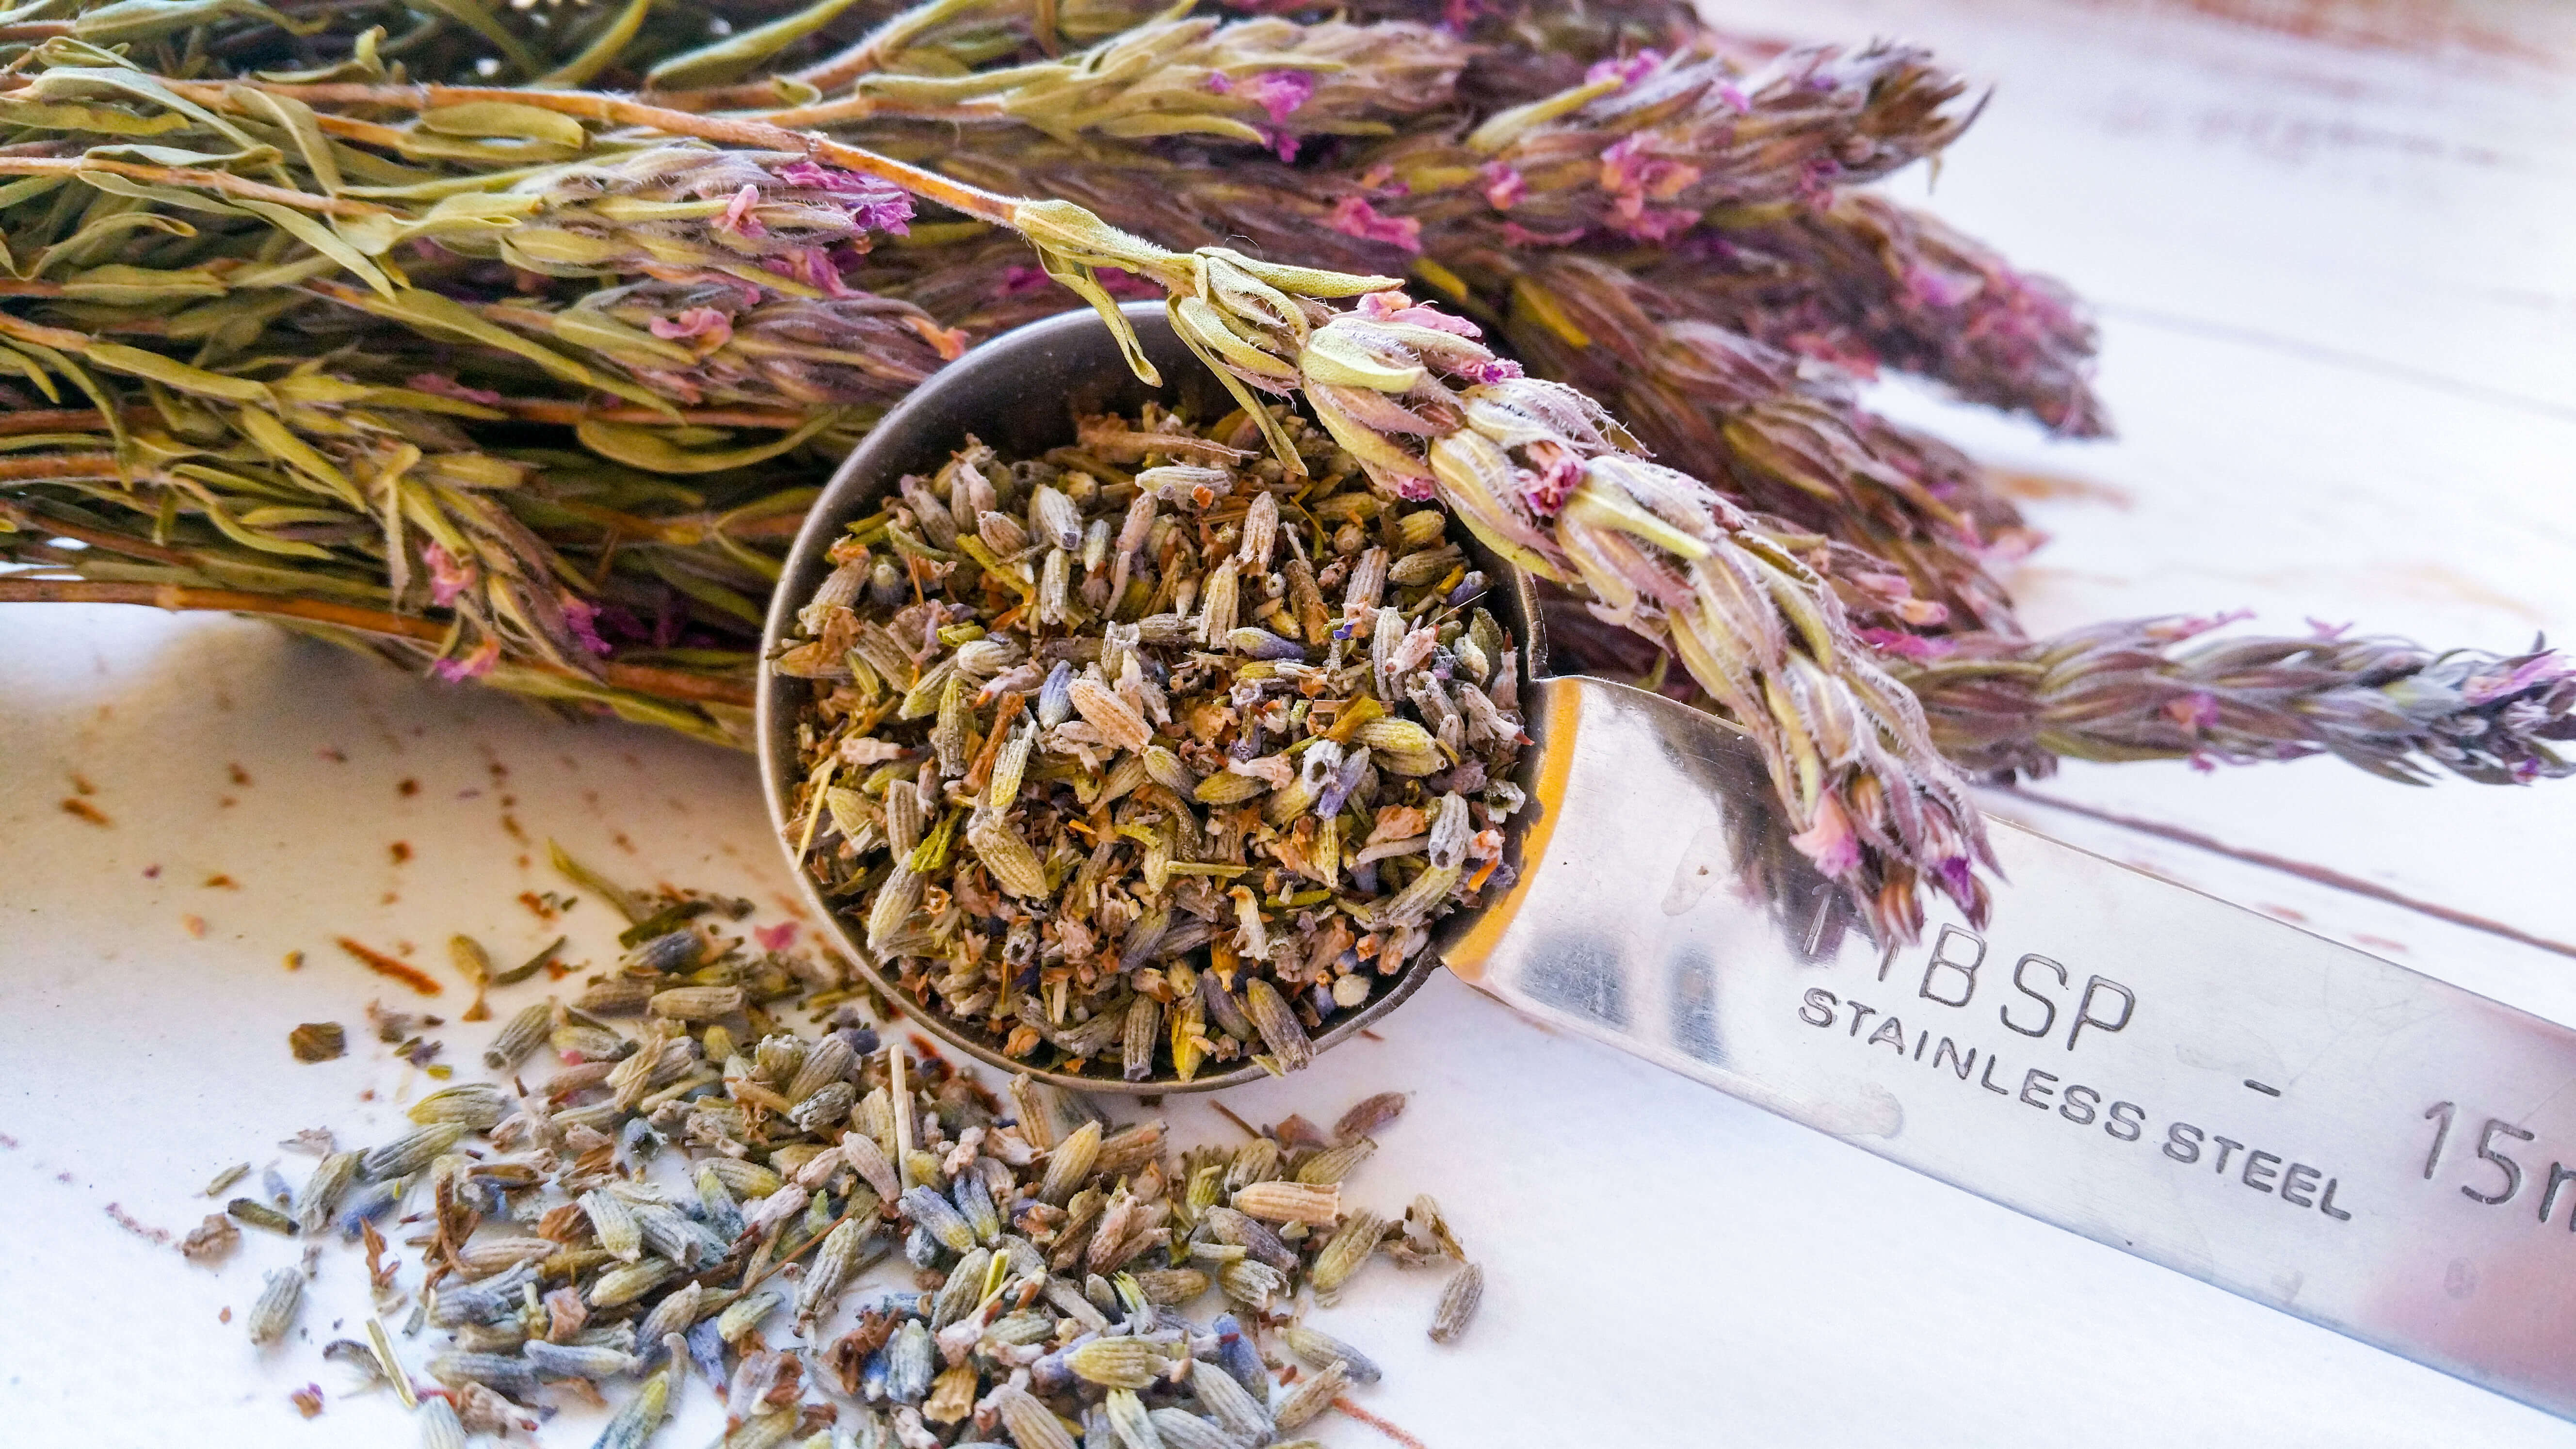 Garlic Shrimp with Herbes de Provence | Kicking Back the Pebbles